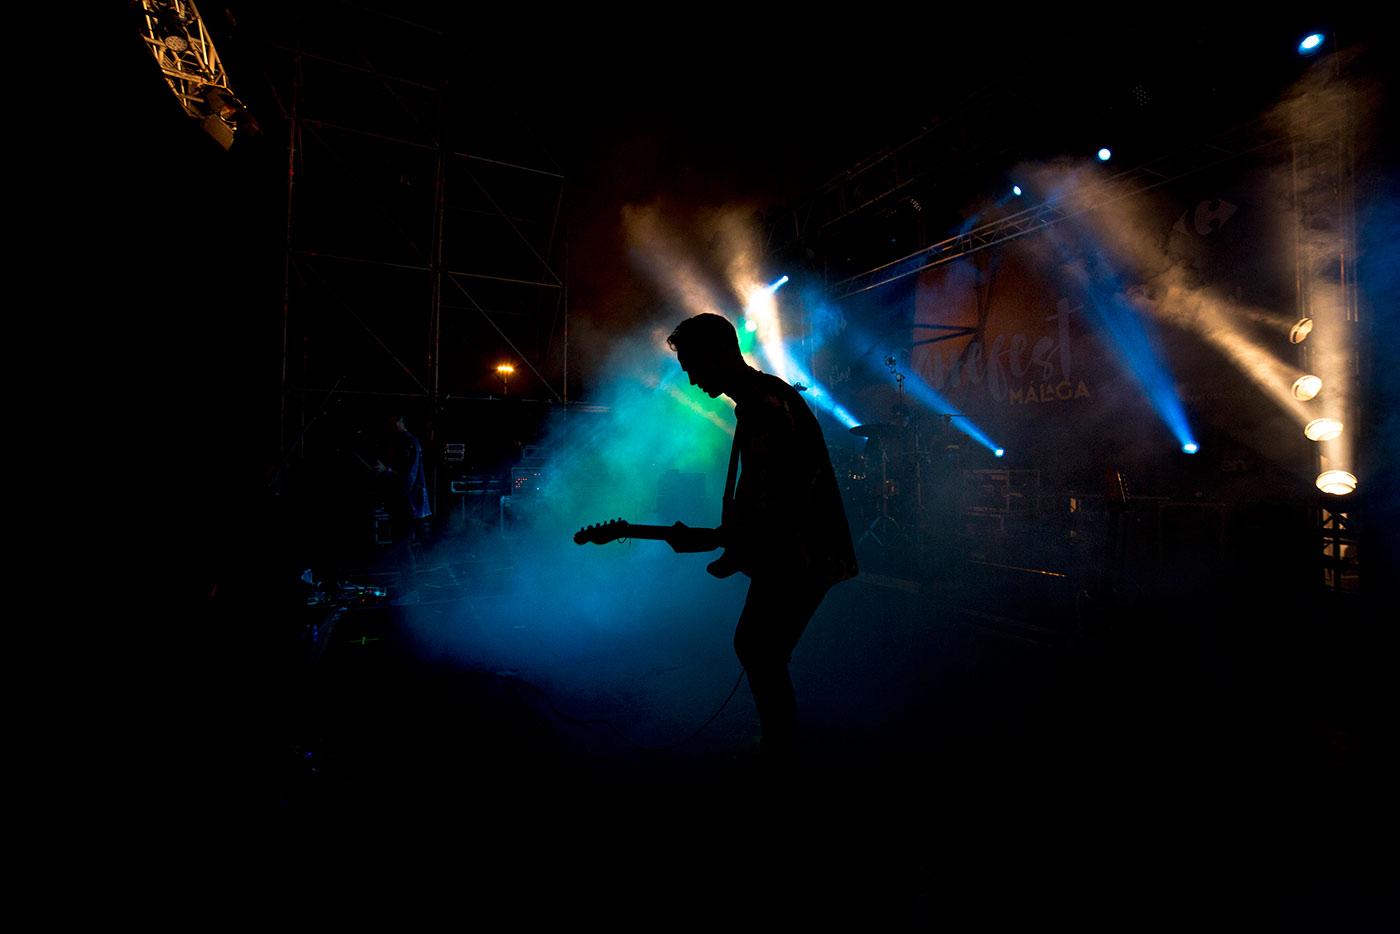 Carrefest Music Talent busca nuevos talentos emergentes